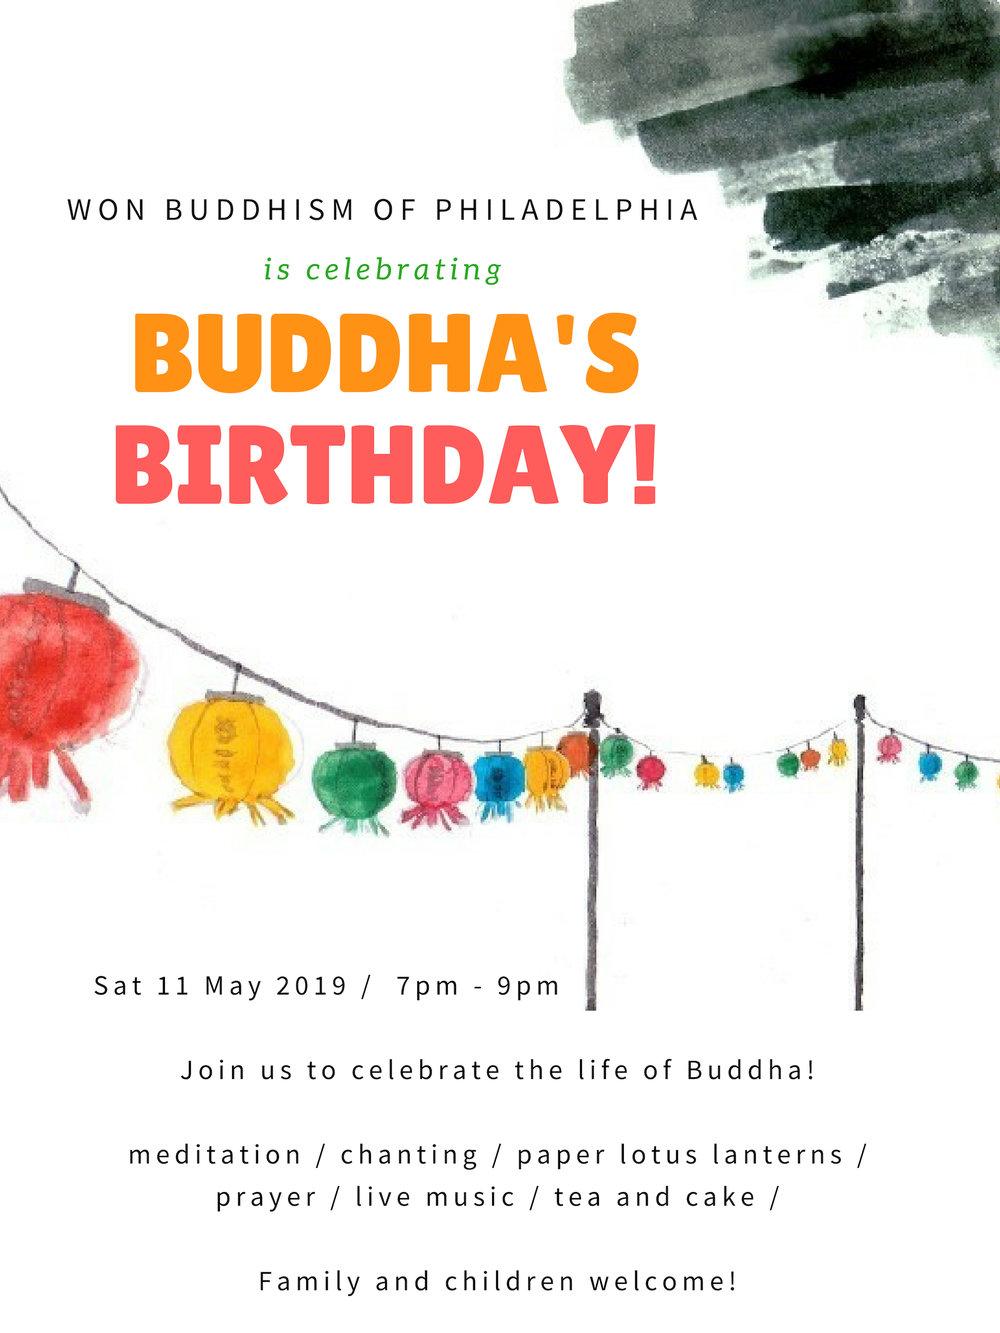 Buddha'sBirthday! (2).jpg